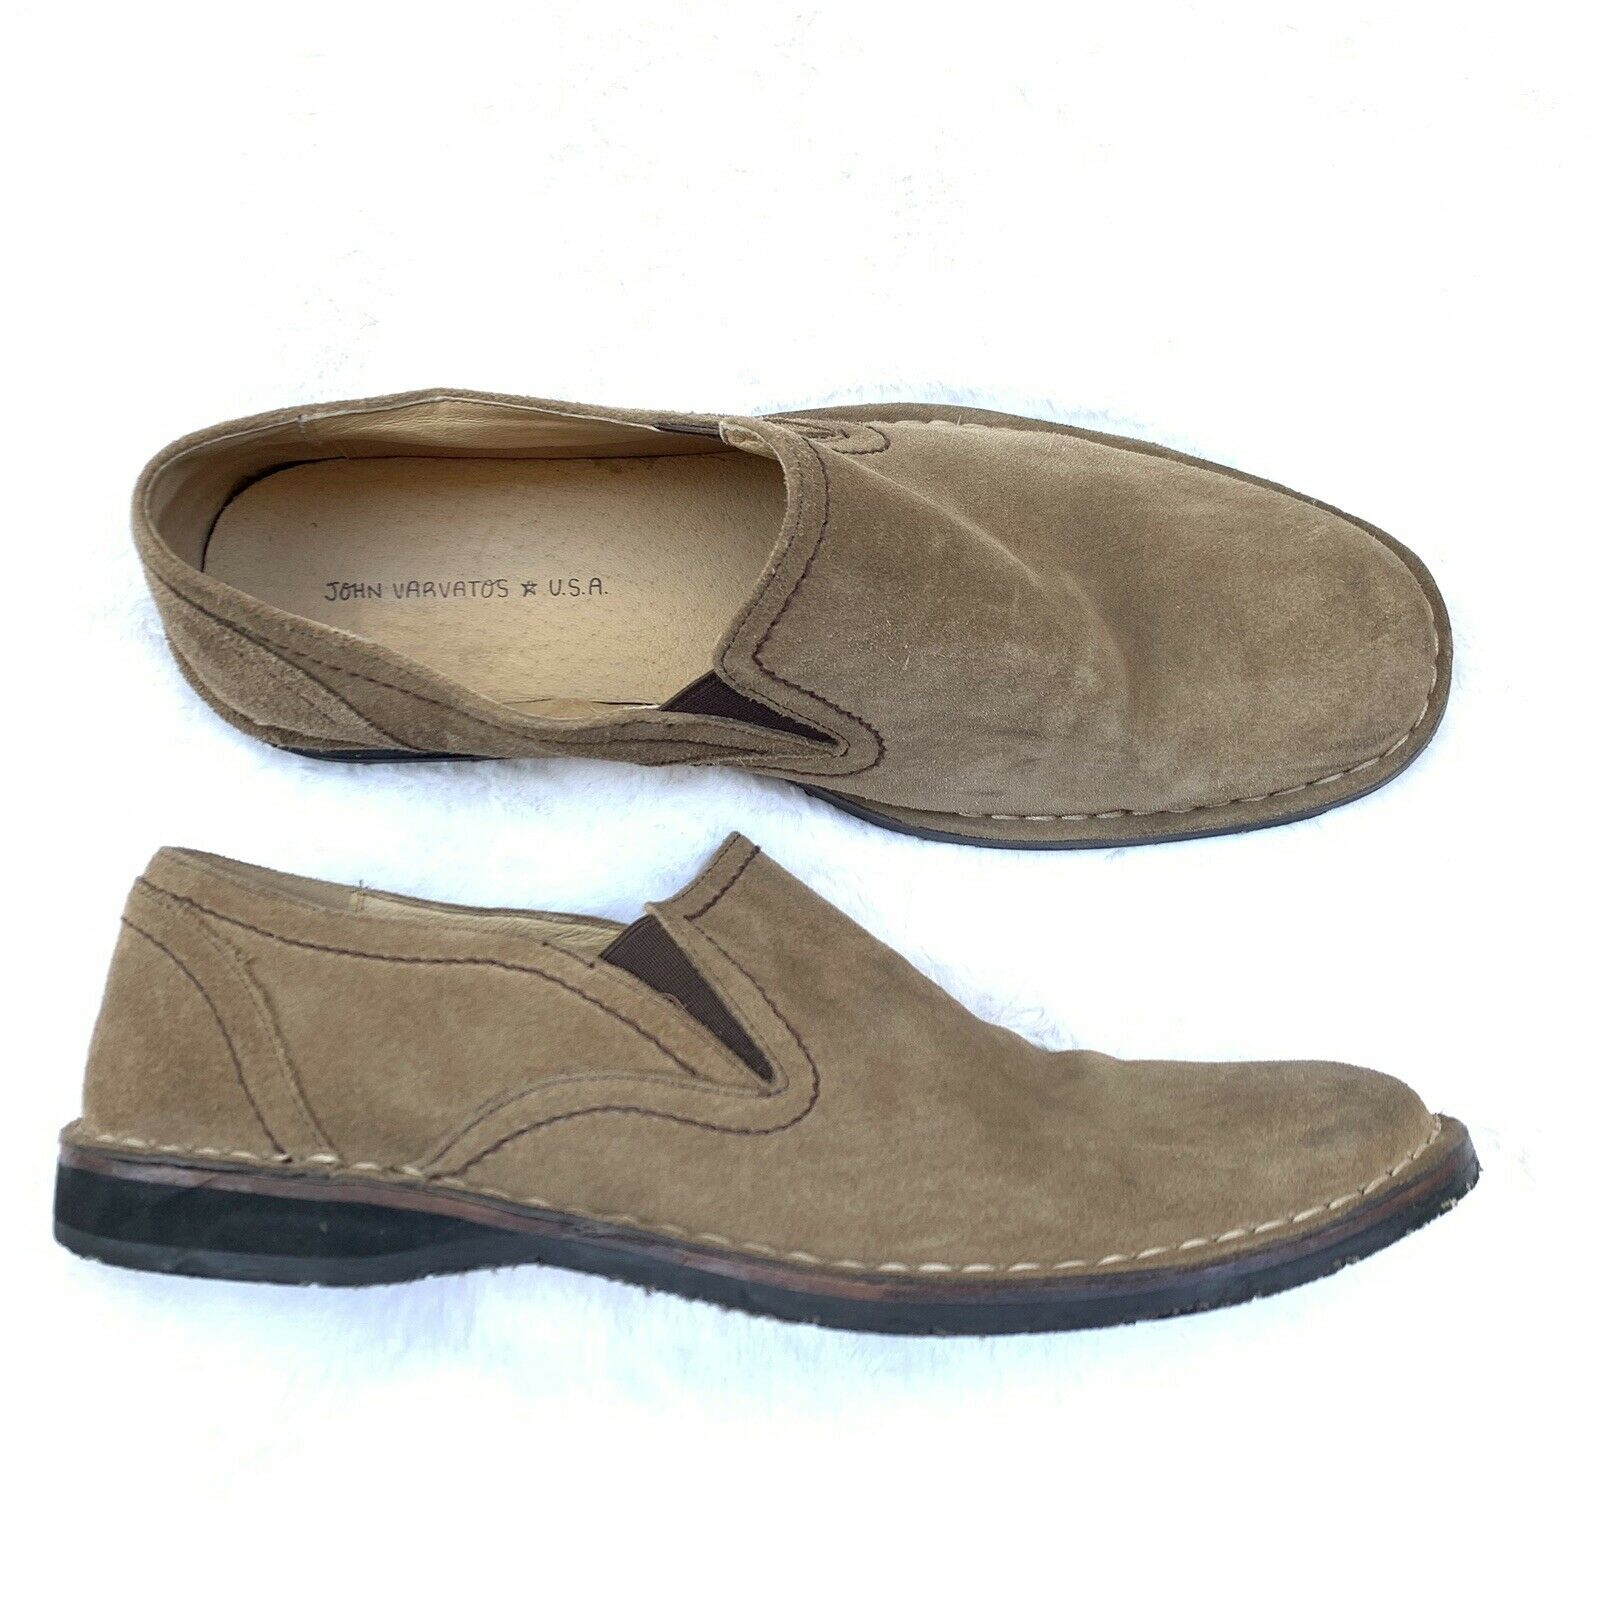 John Varvatos USA Loafers Slip On shoes Mens Size 12 Leather Suede Beige Sand